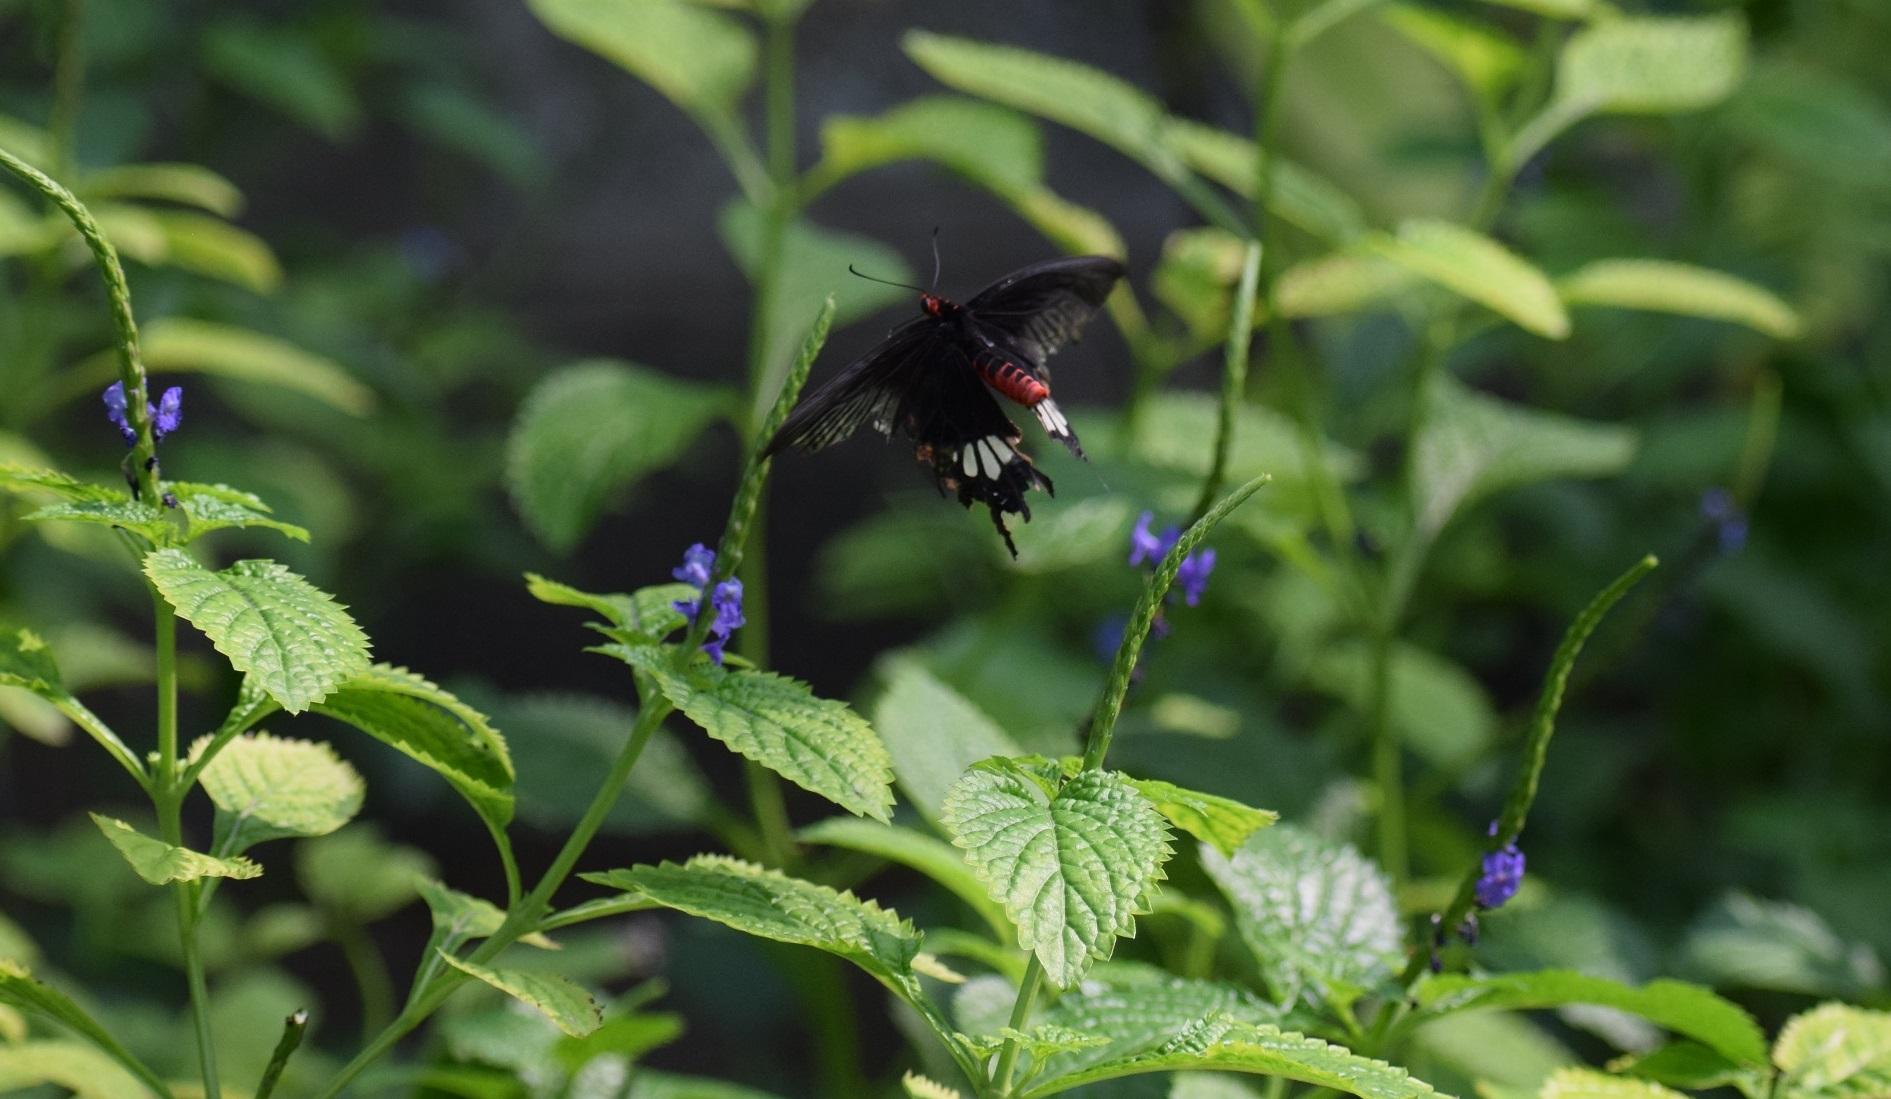 butterfly DSLR photos